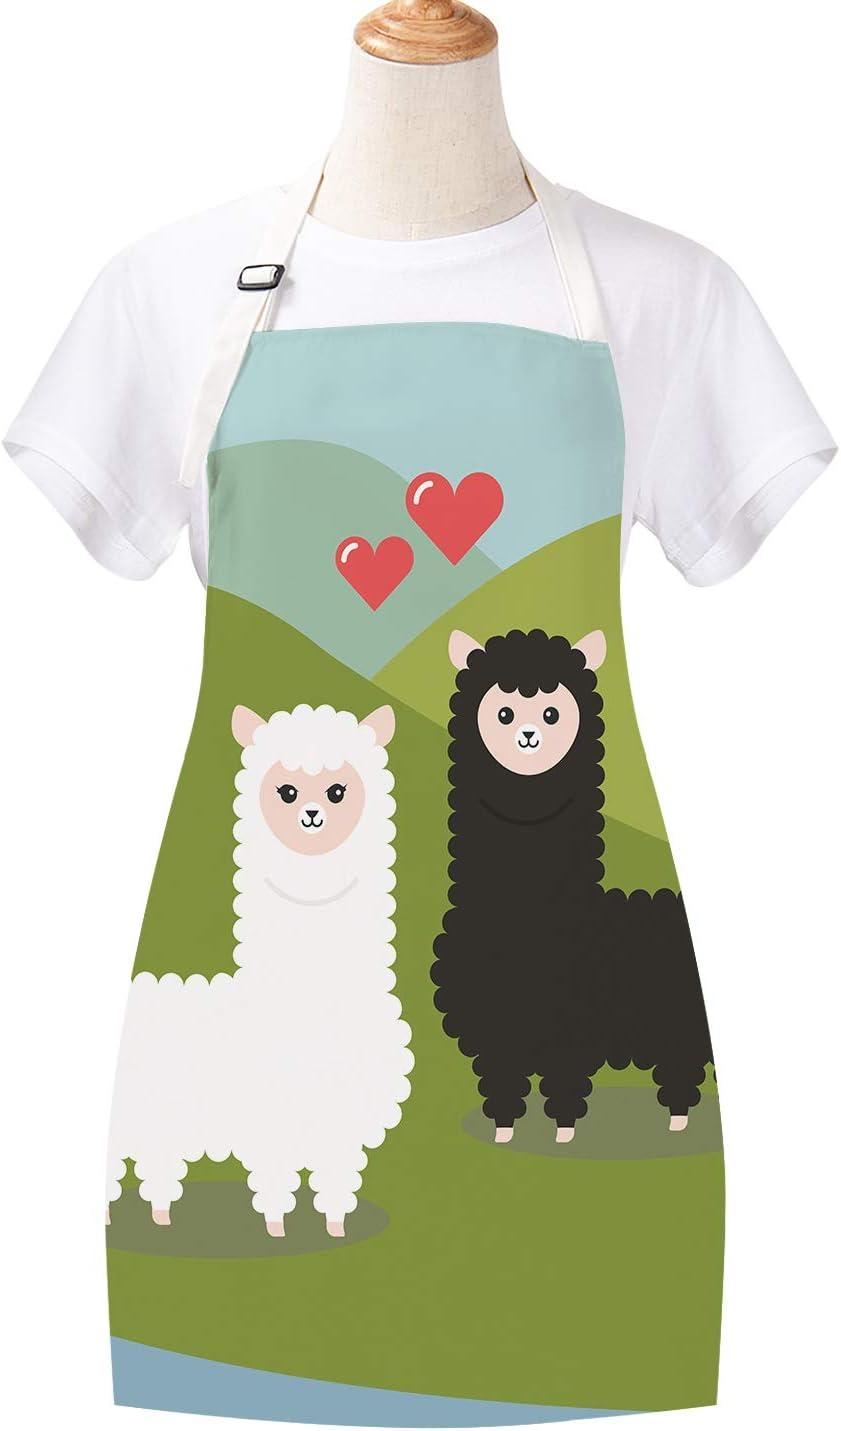 Cute Women Alpacas Apron Baking Kitchen Aprons Cooking Animal Apron for Women Waterproof